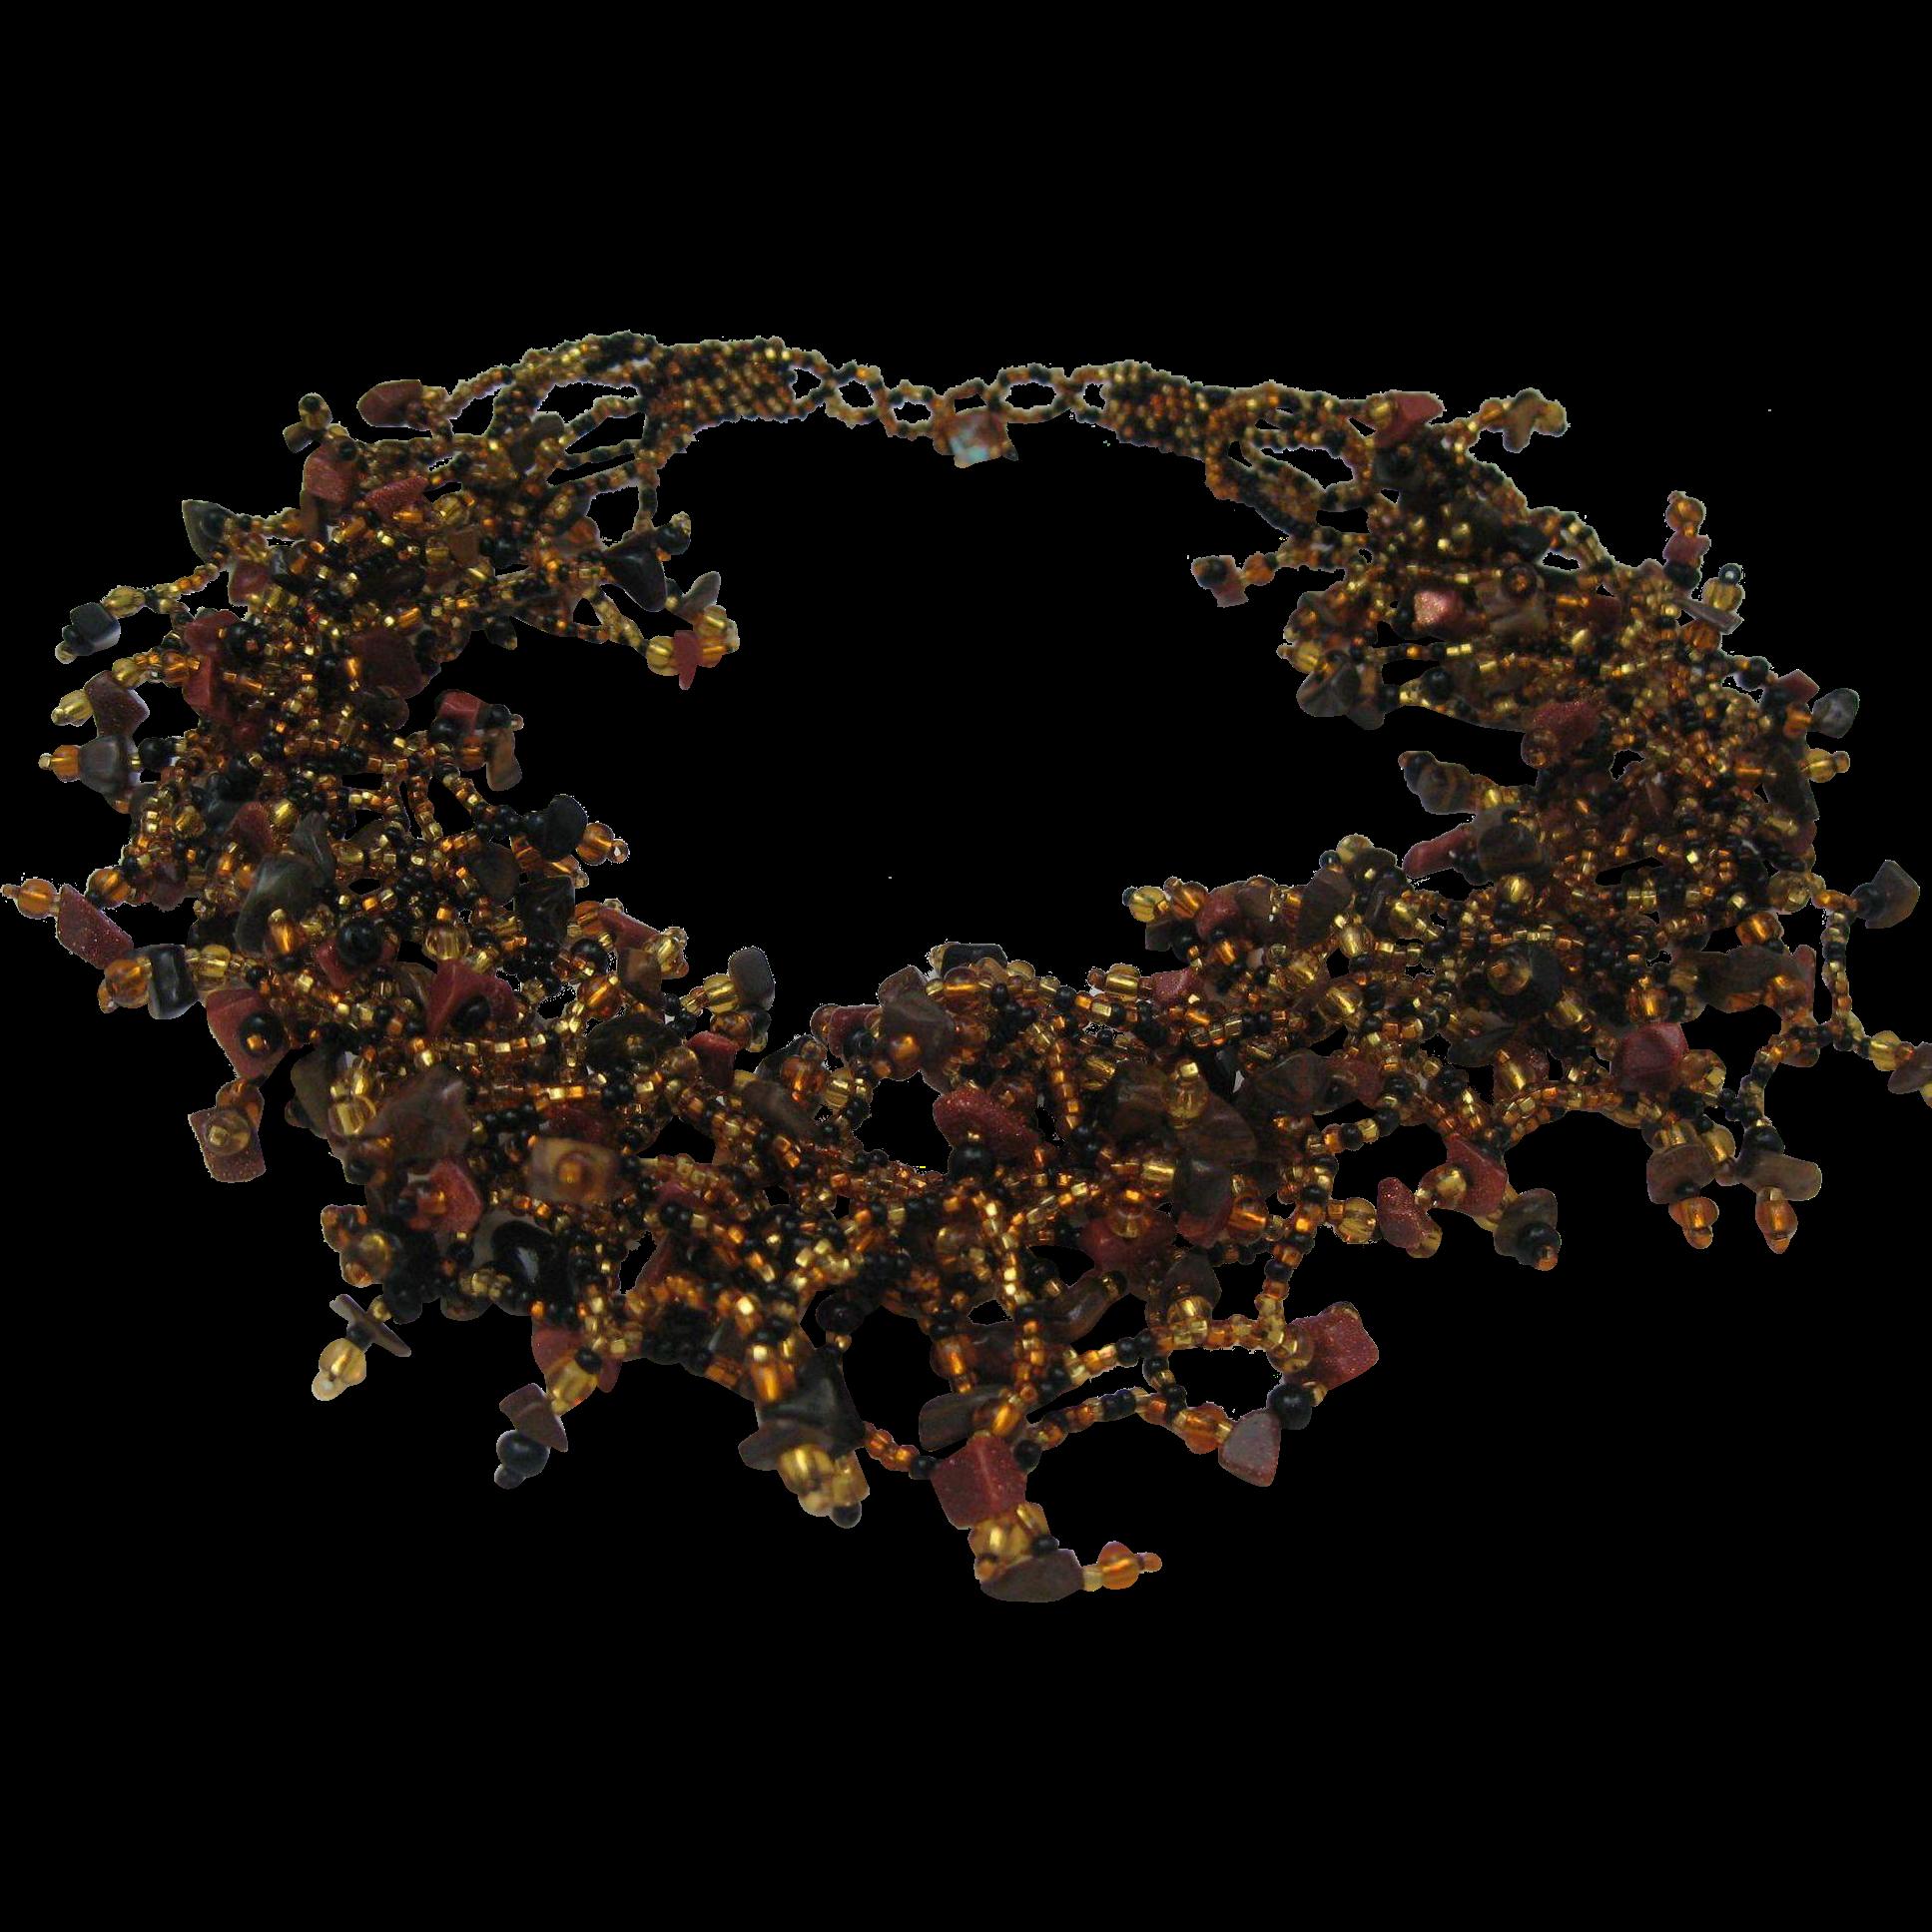 Copper Glass Web Necklace